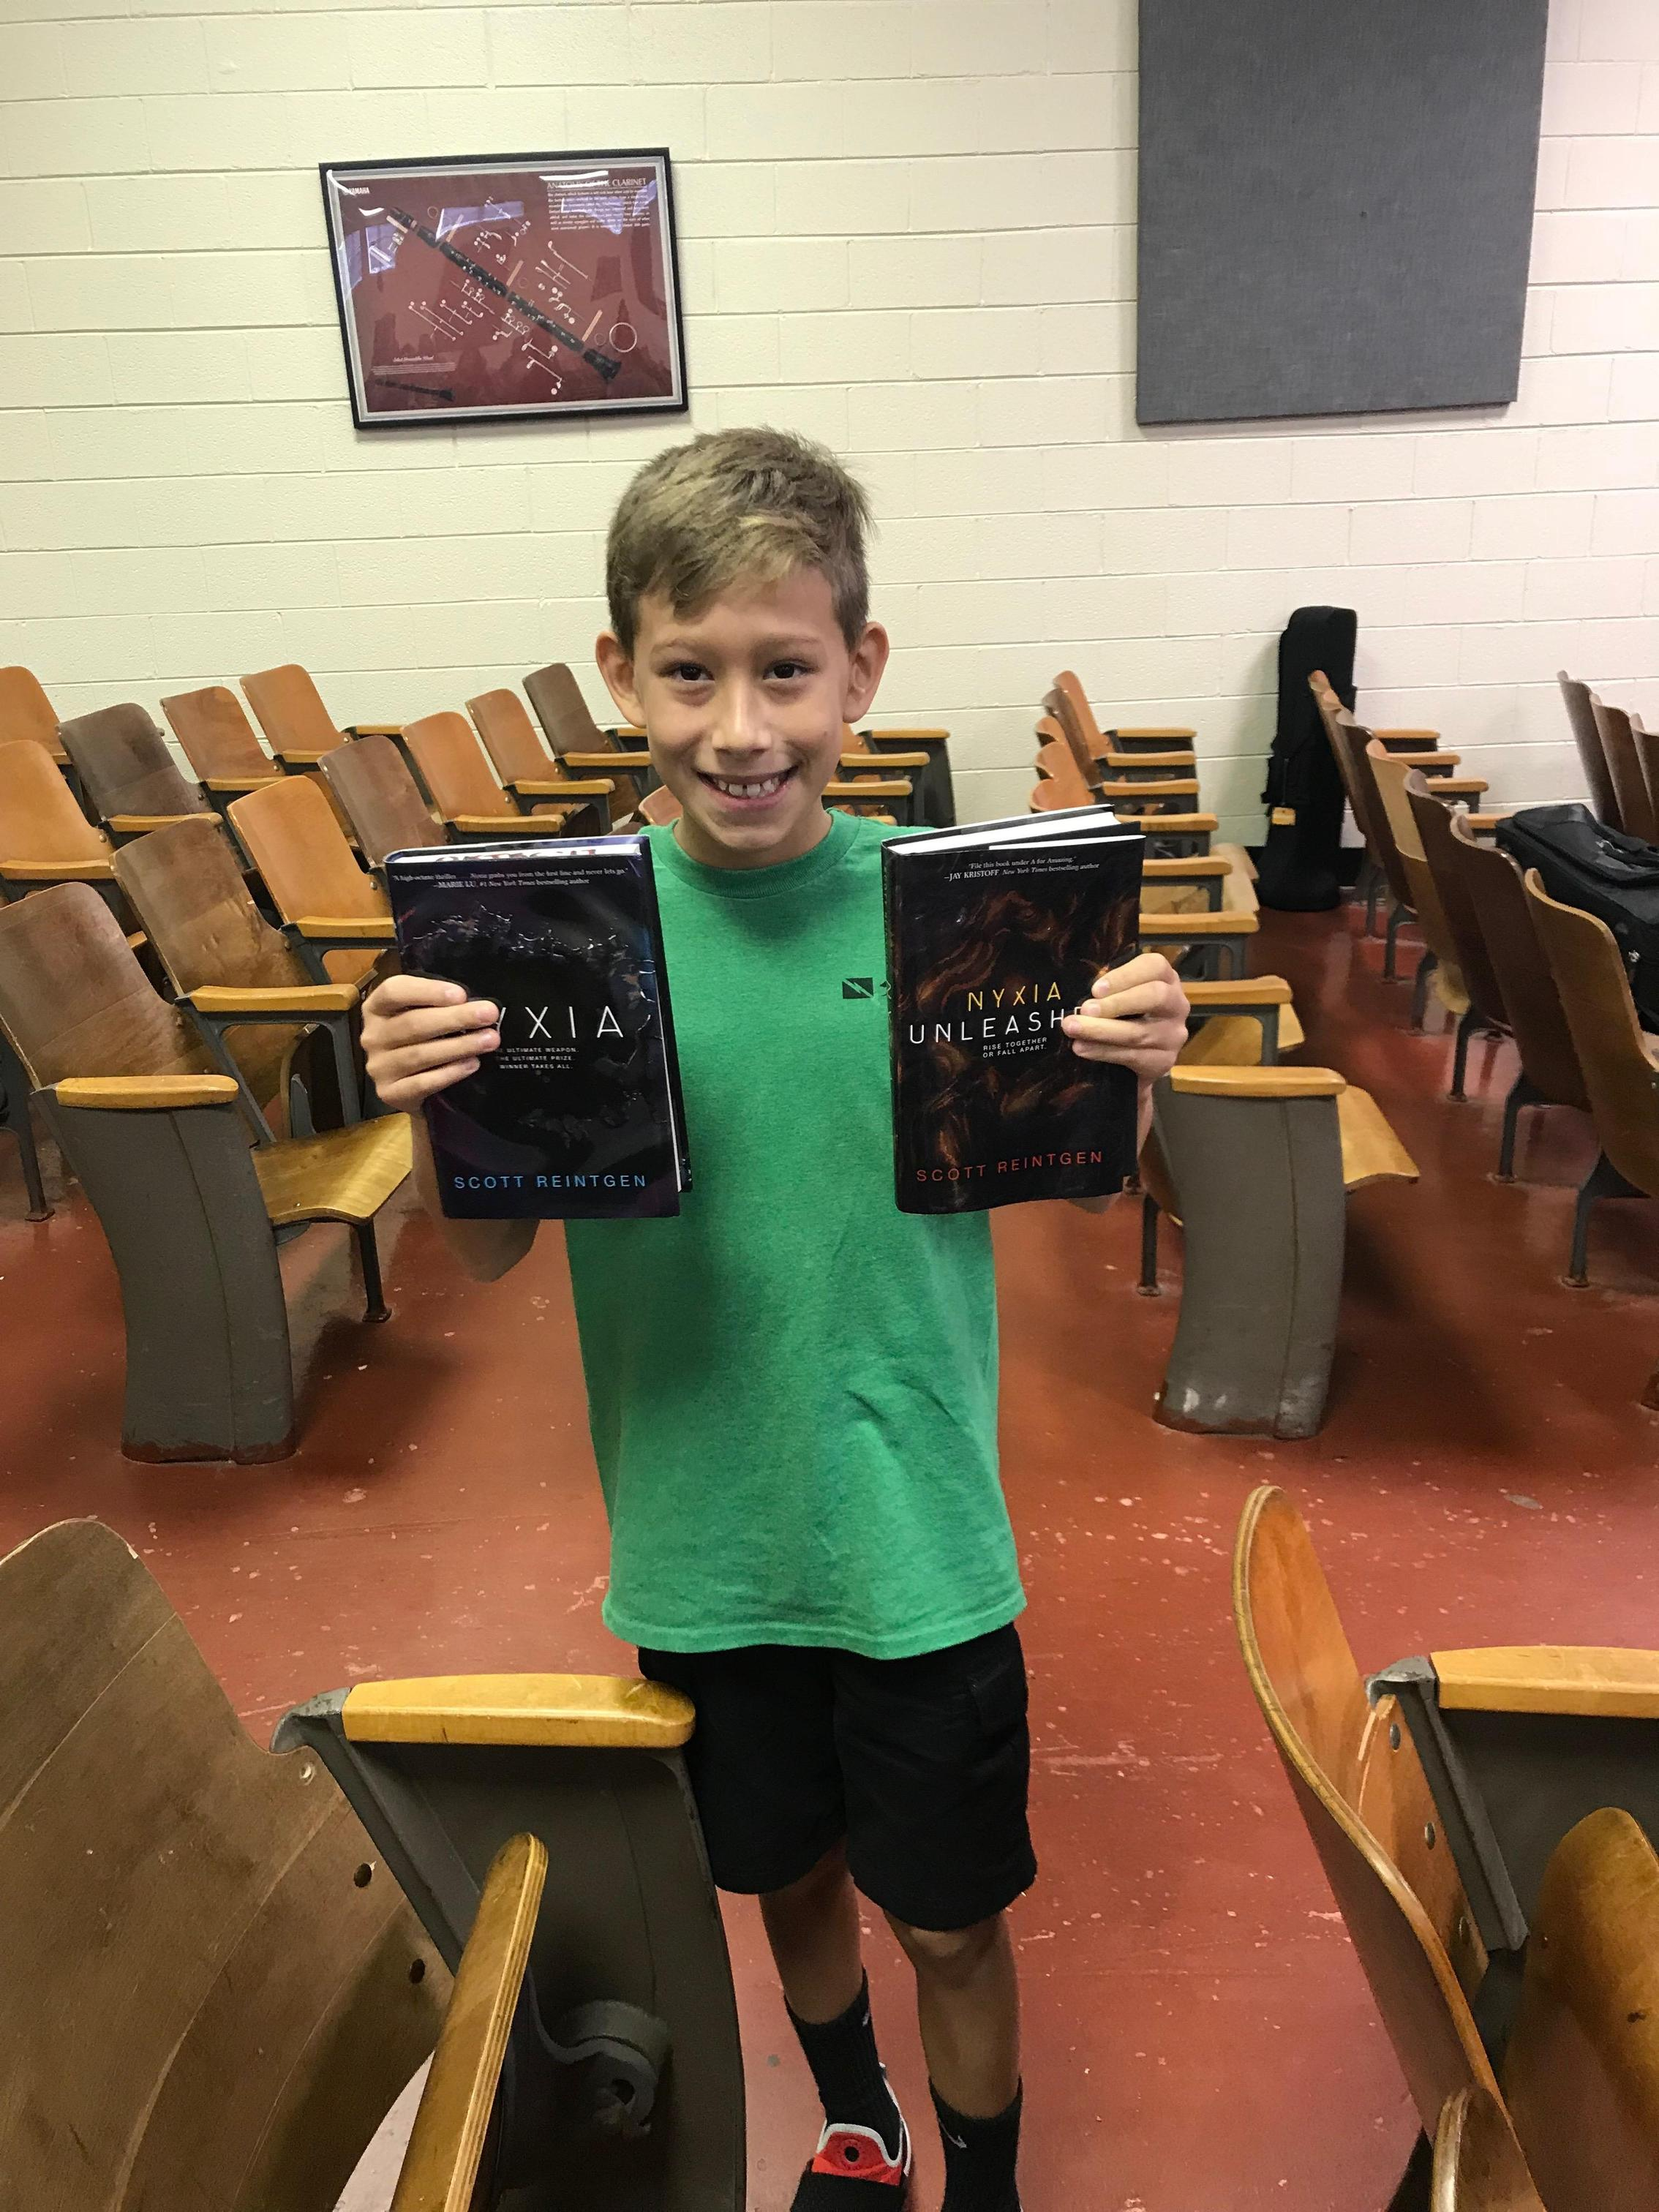 Student wins copies of Scott Reignten's novels.